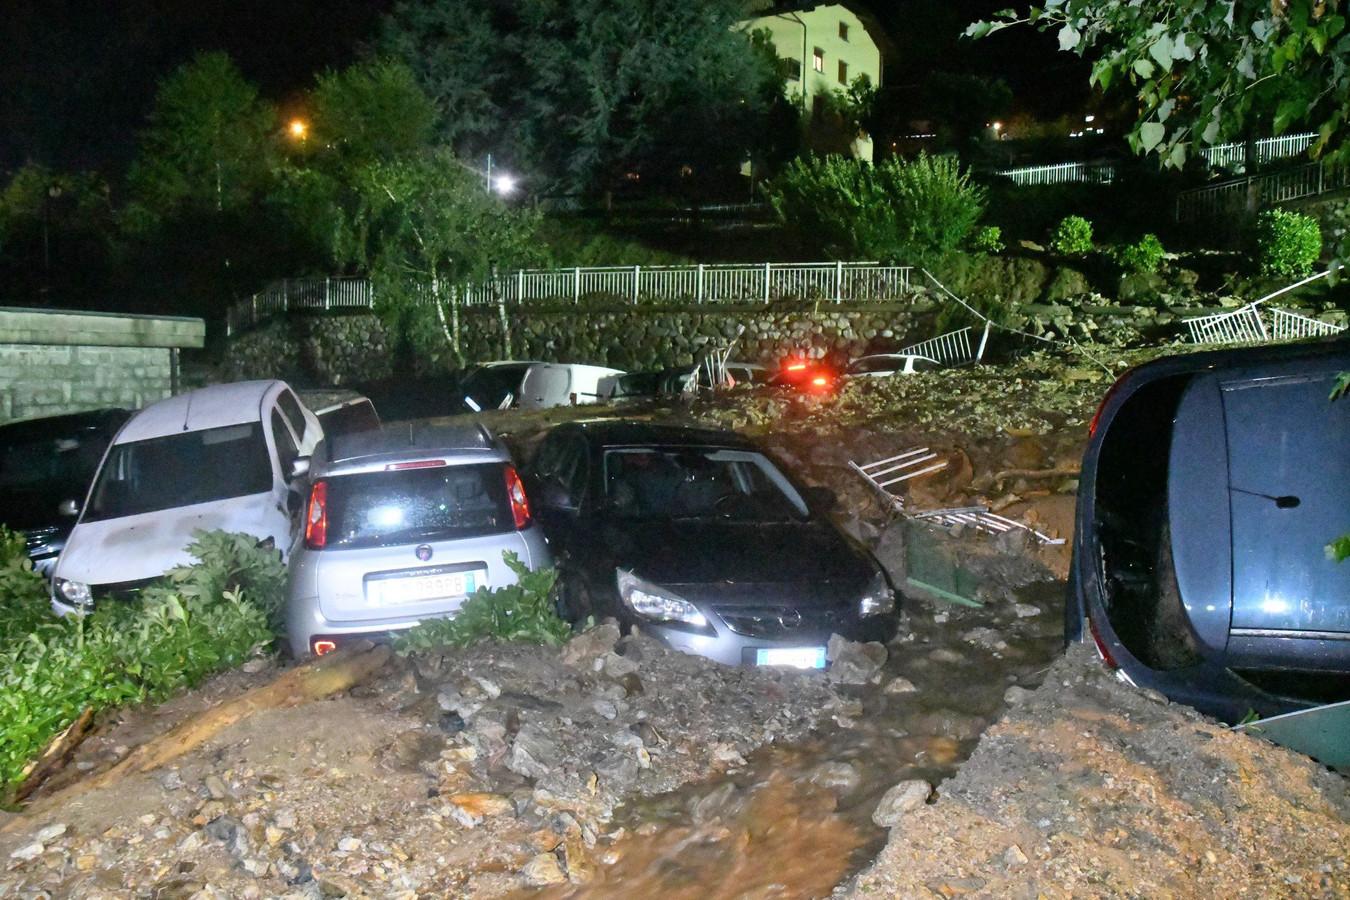 Verwoeste voertuigen in Casargo, Lecco, Italië.